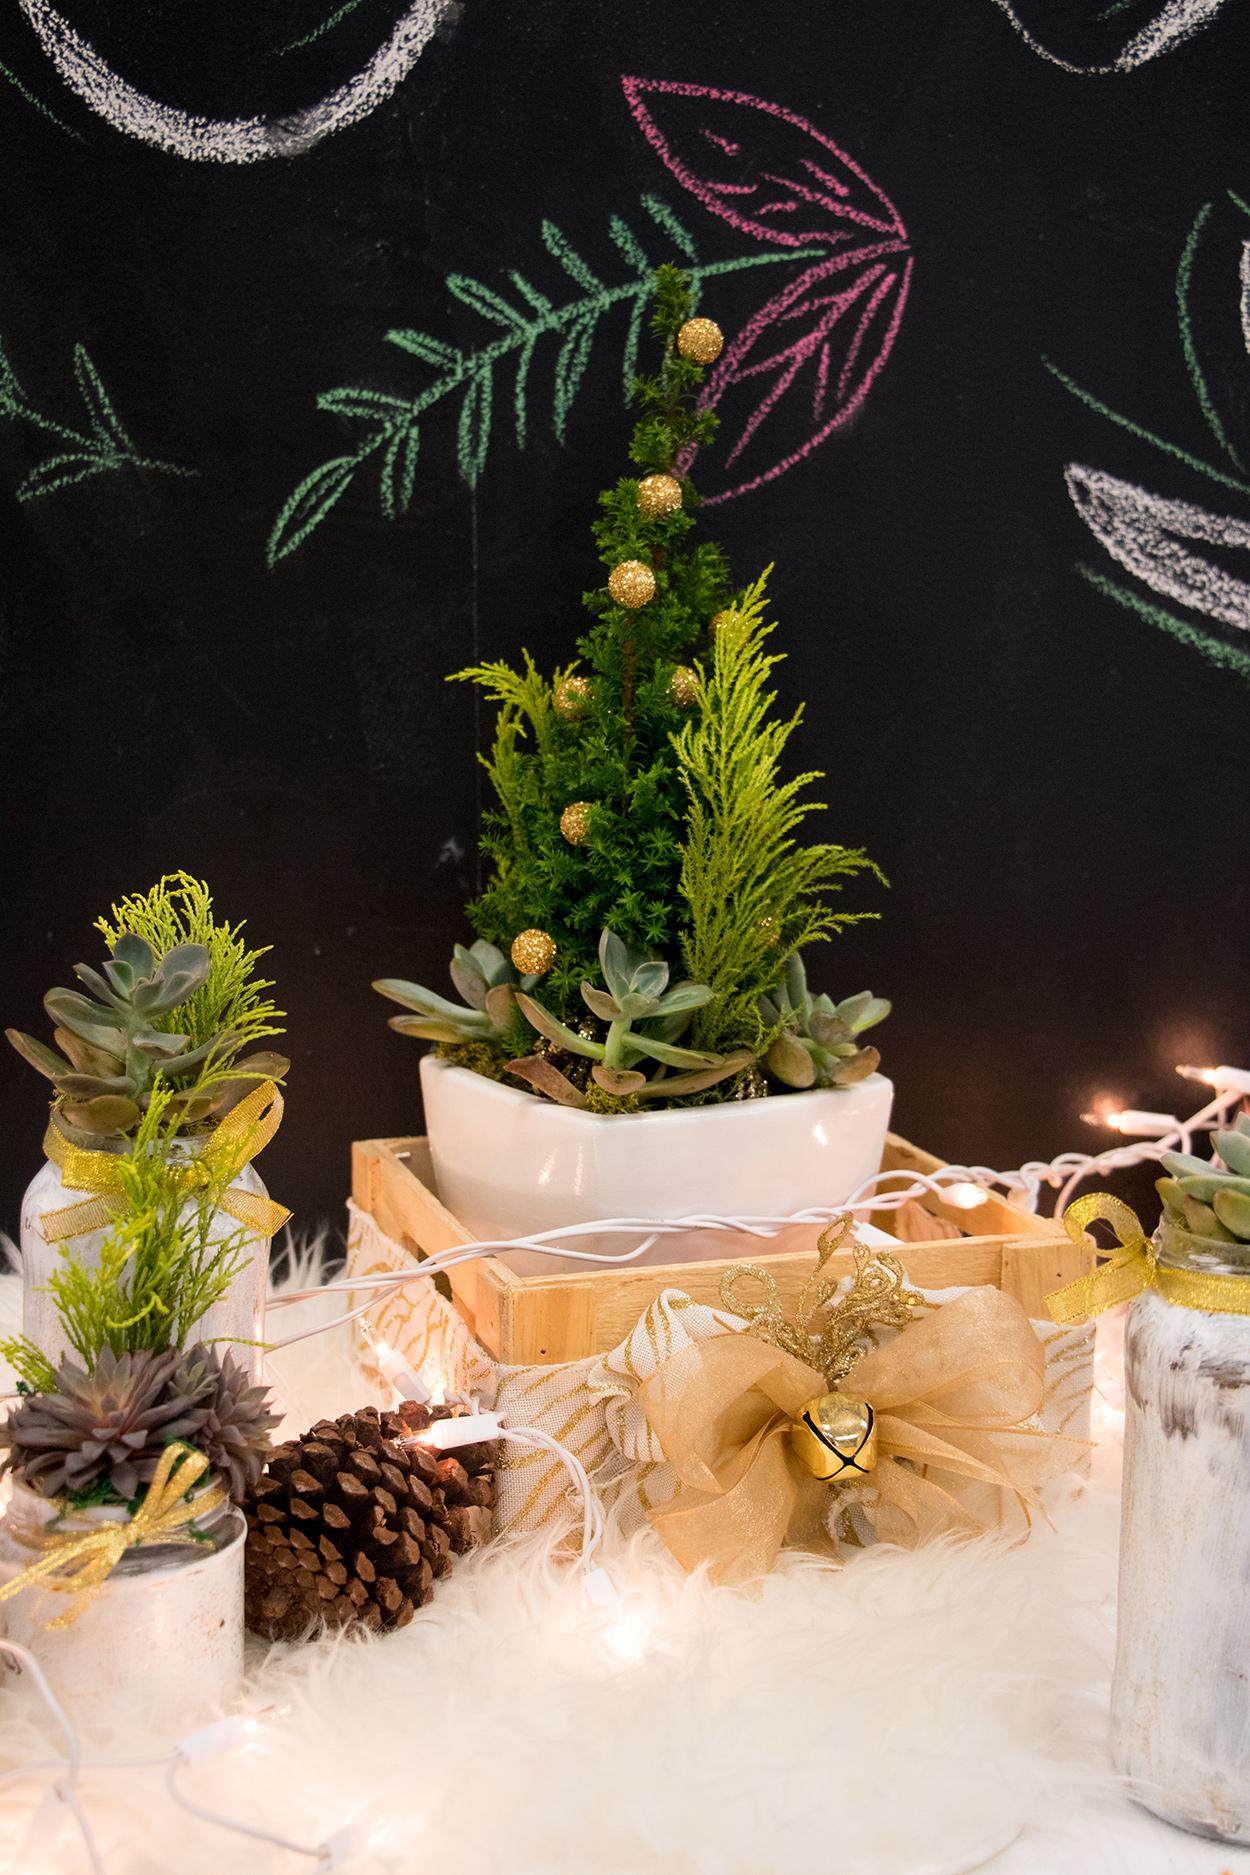 Fun Christmas Table Decor | The Key To Blog Blogging Creative Workshop